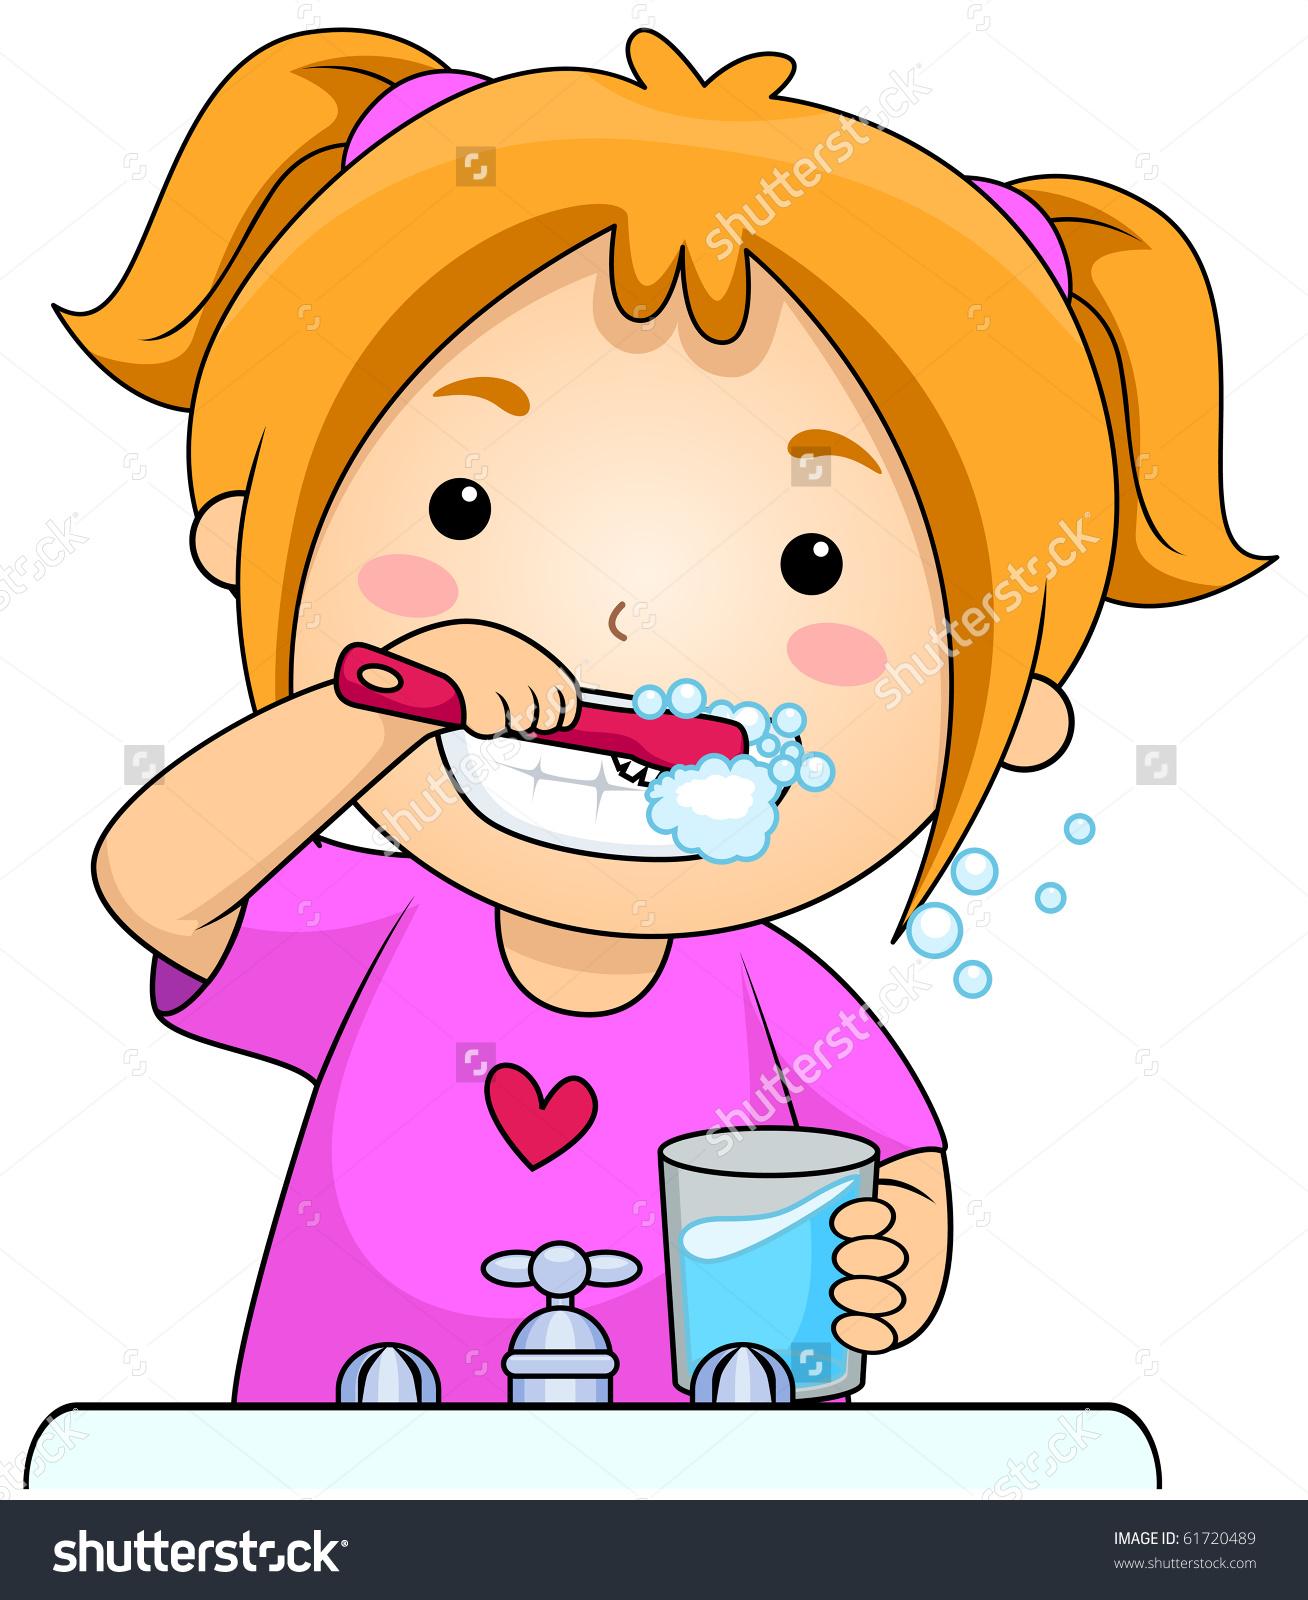 Brush Teeth Clipart & Brush Teeth Clip Art Images.